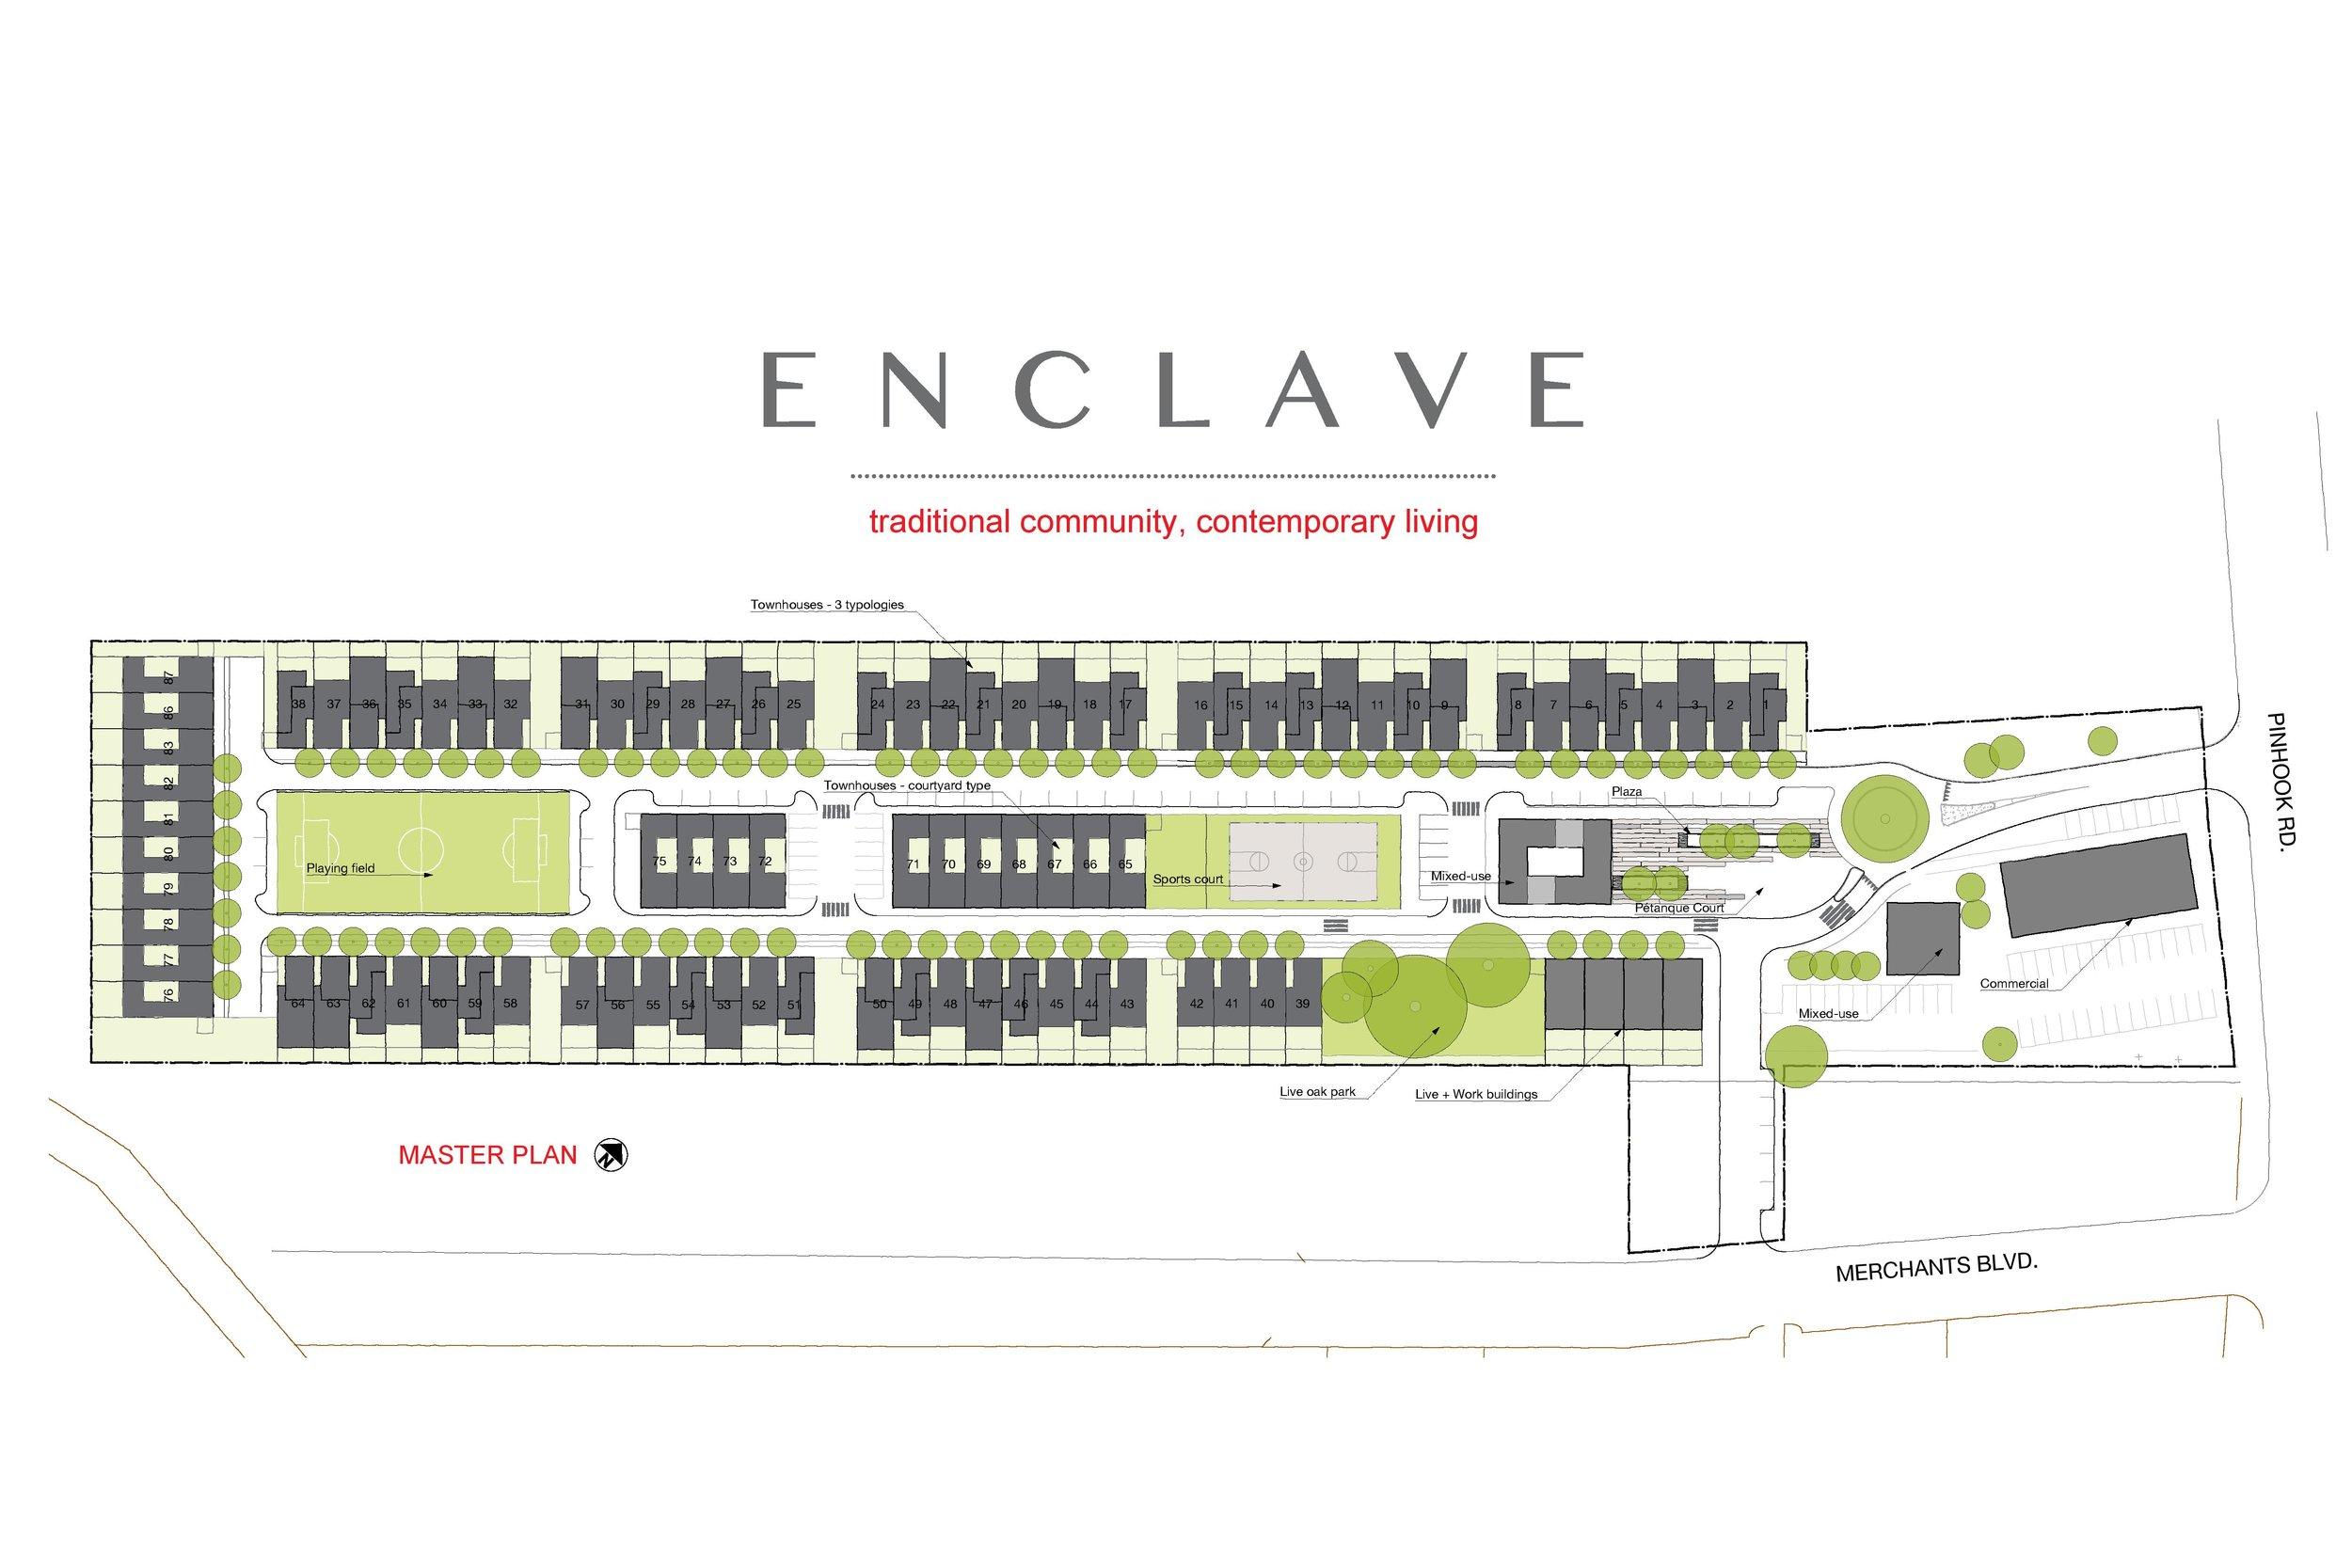 enclave master plan-page-001.jpg